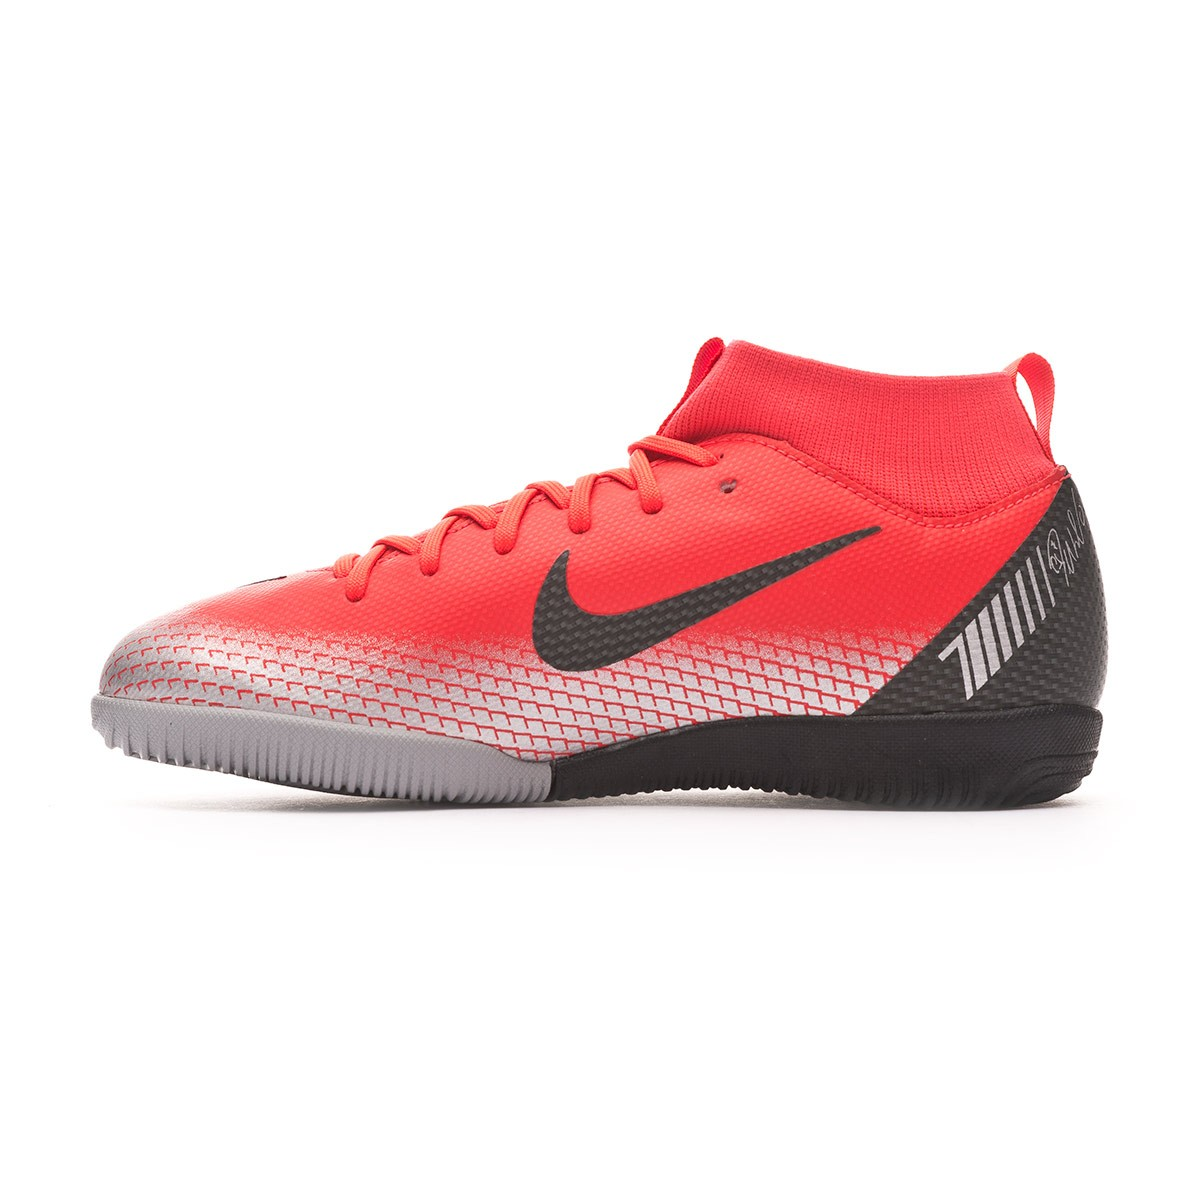 93ee2073f0fe Futsal Boot Nike Kids Mercurial SuperflyX VI Academy CR7 IC Bright  crimson-Black-Chrome-Dark grey - Leaked soccer